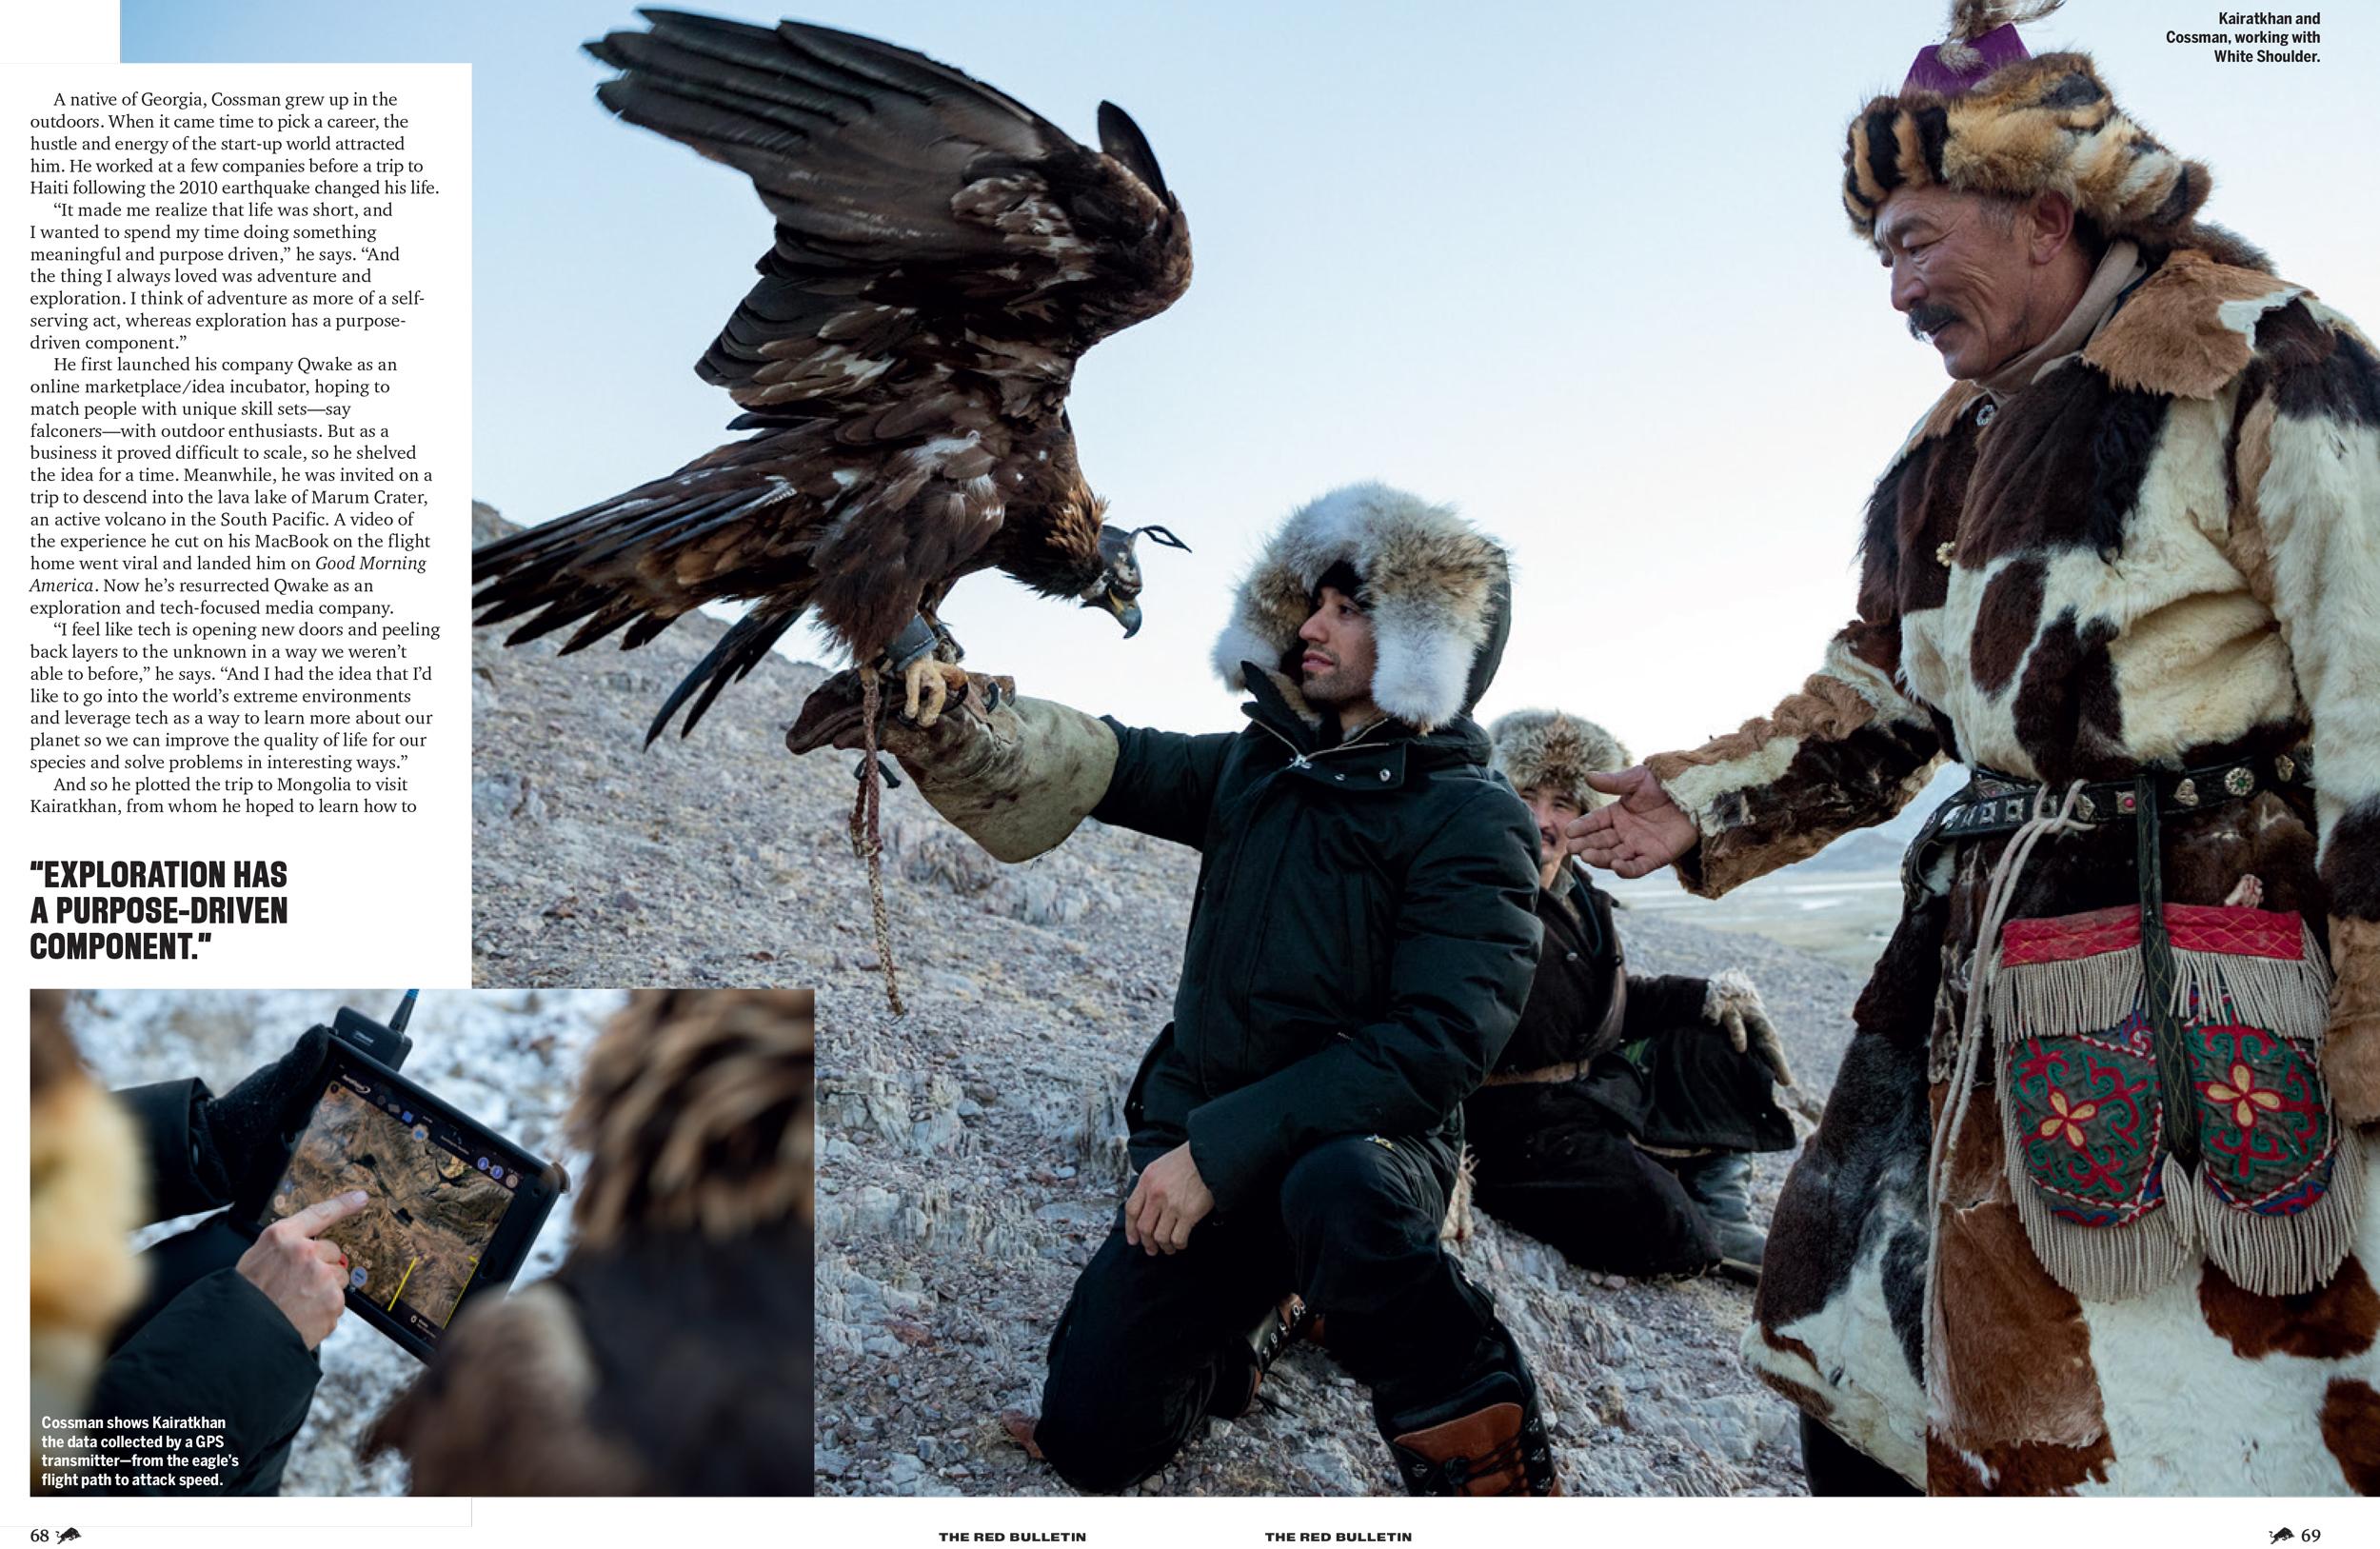 The_Red_Bulletin_Eagle_Hunters_003.jpg